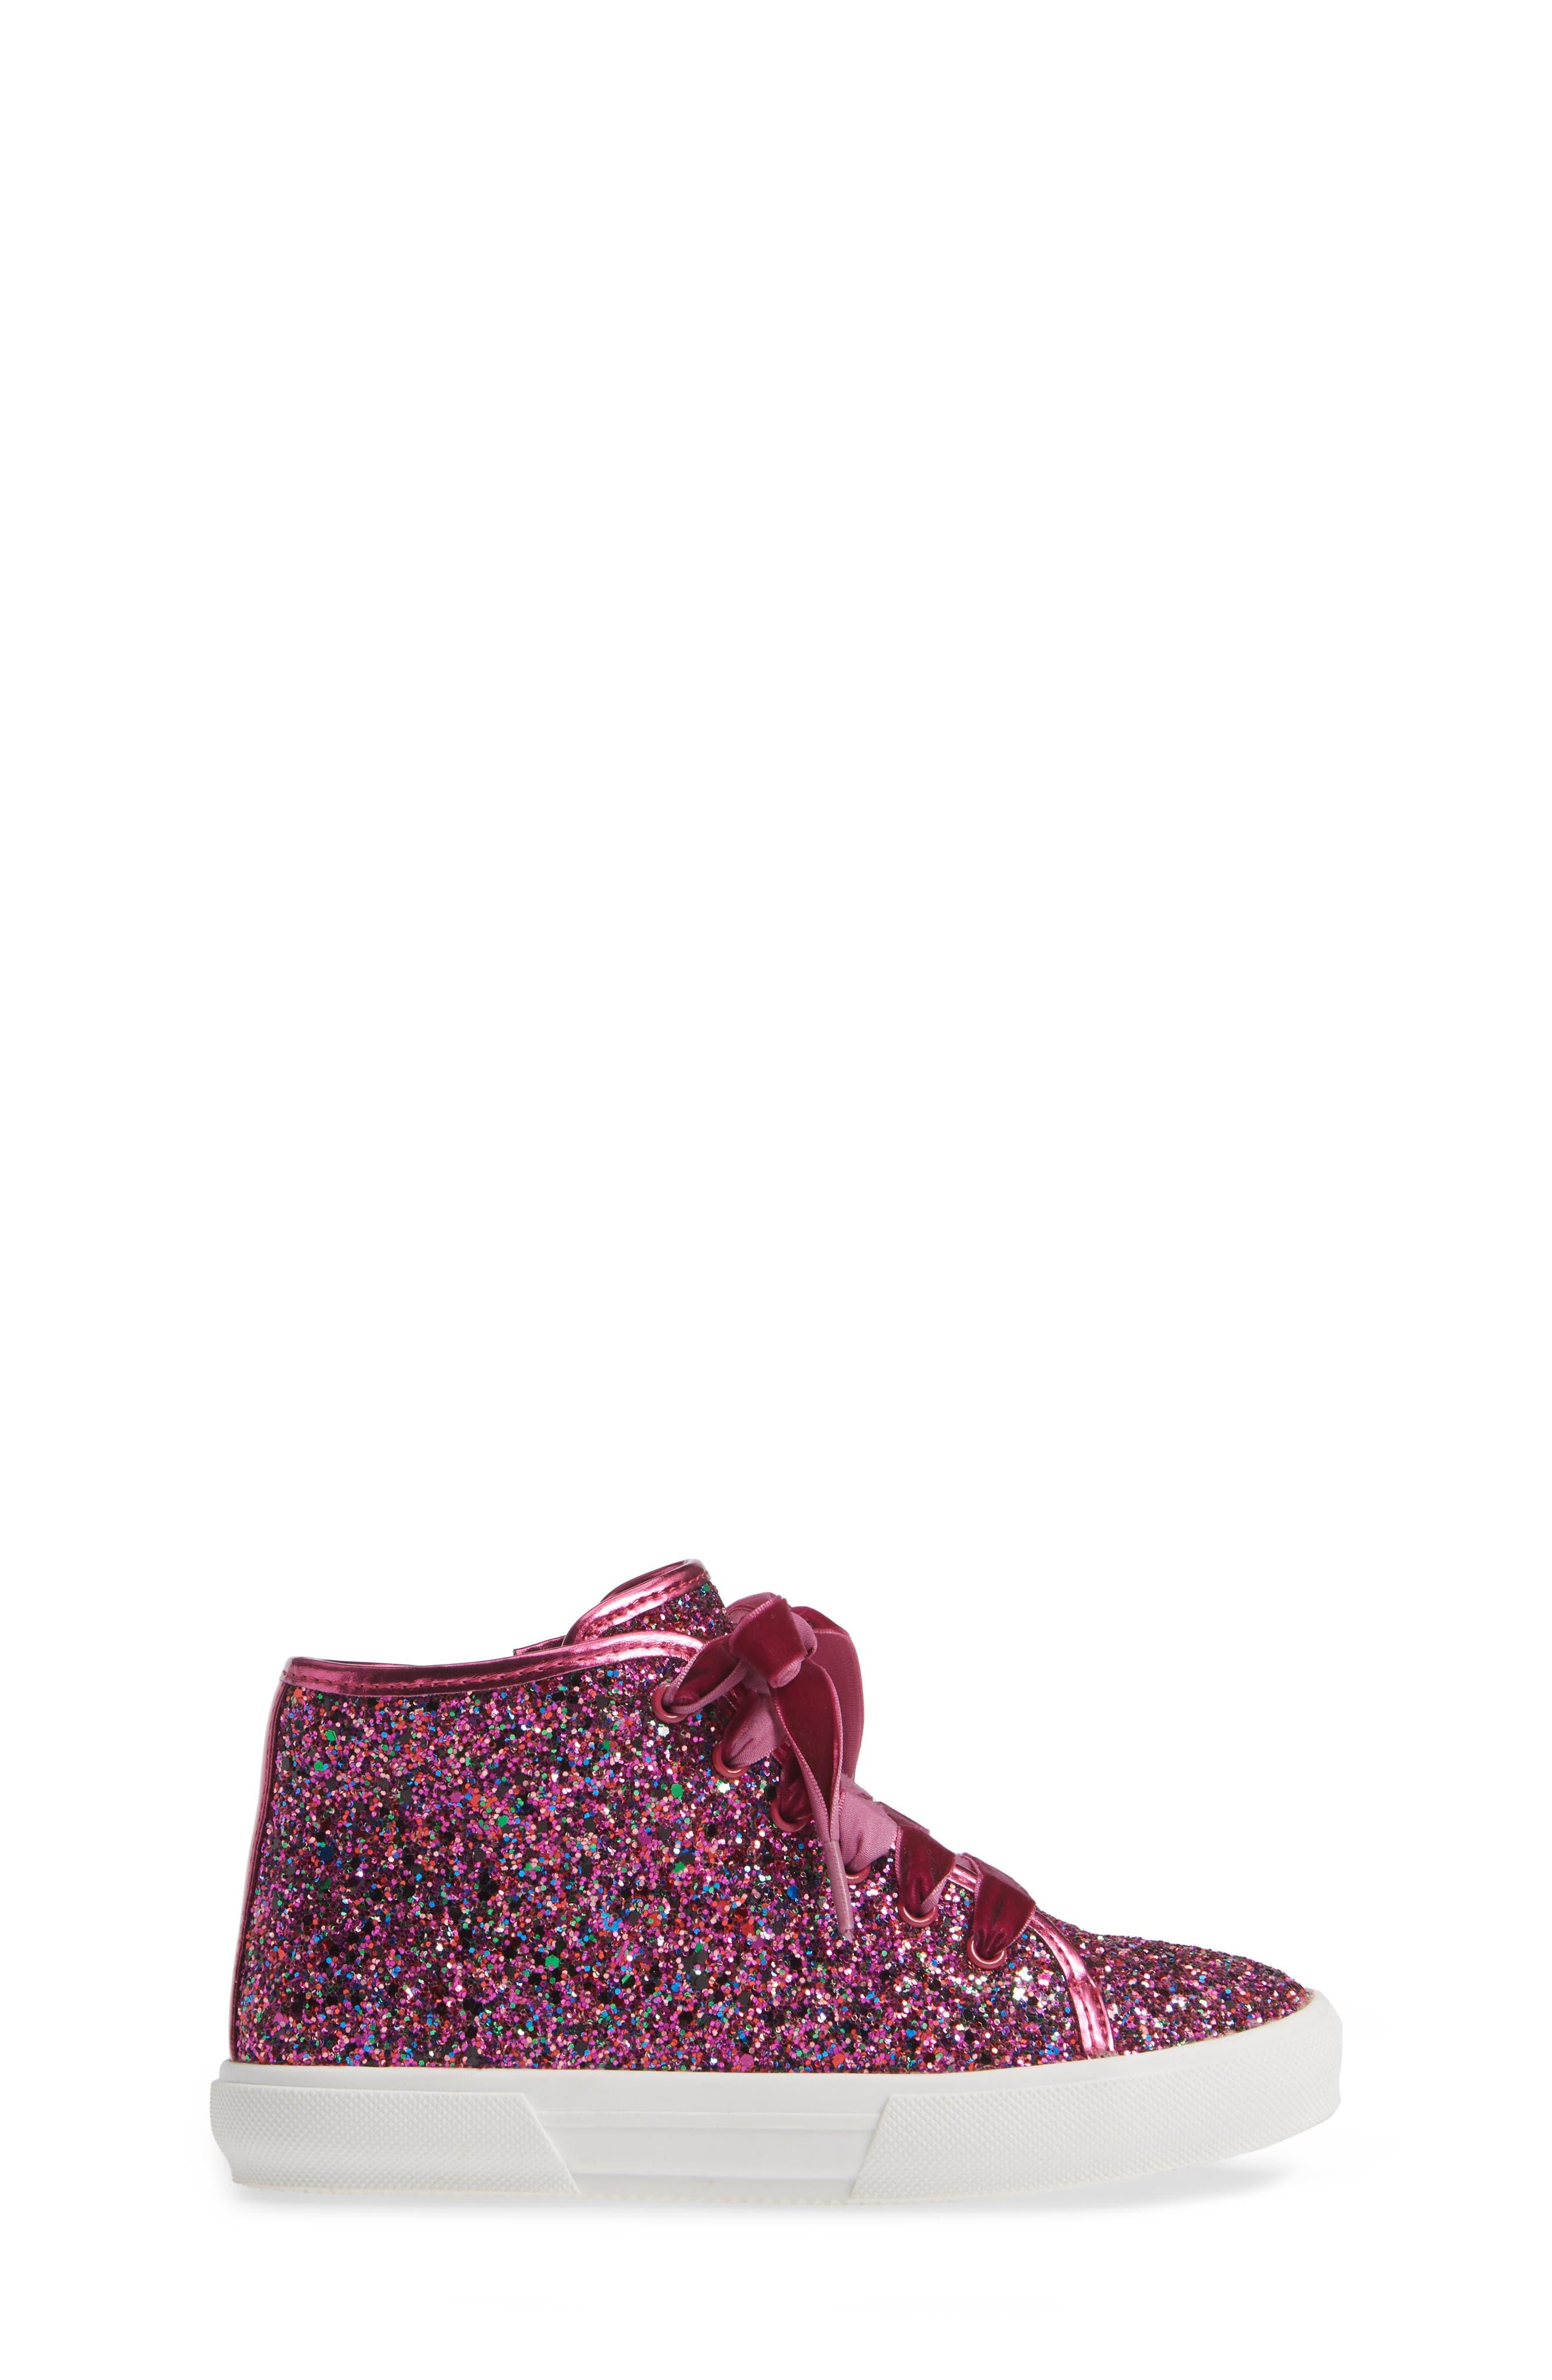 TUCKER + TATE, Skylar Glitter Sneaker, Alternate thumbnail 3, color, FUSCHIA MULTI GLITTER PU